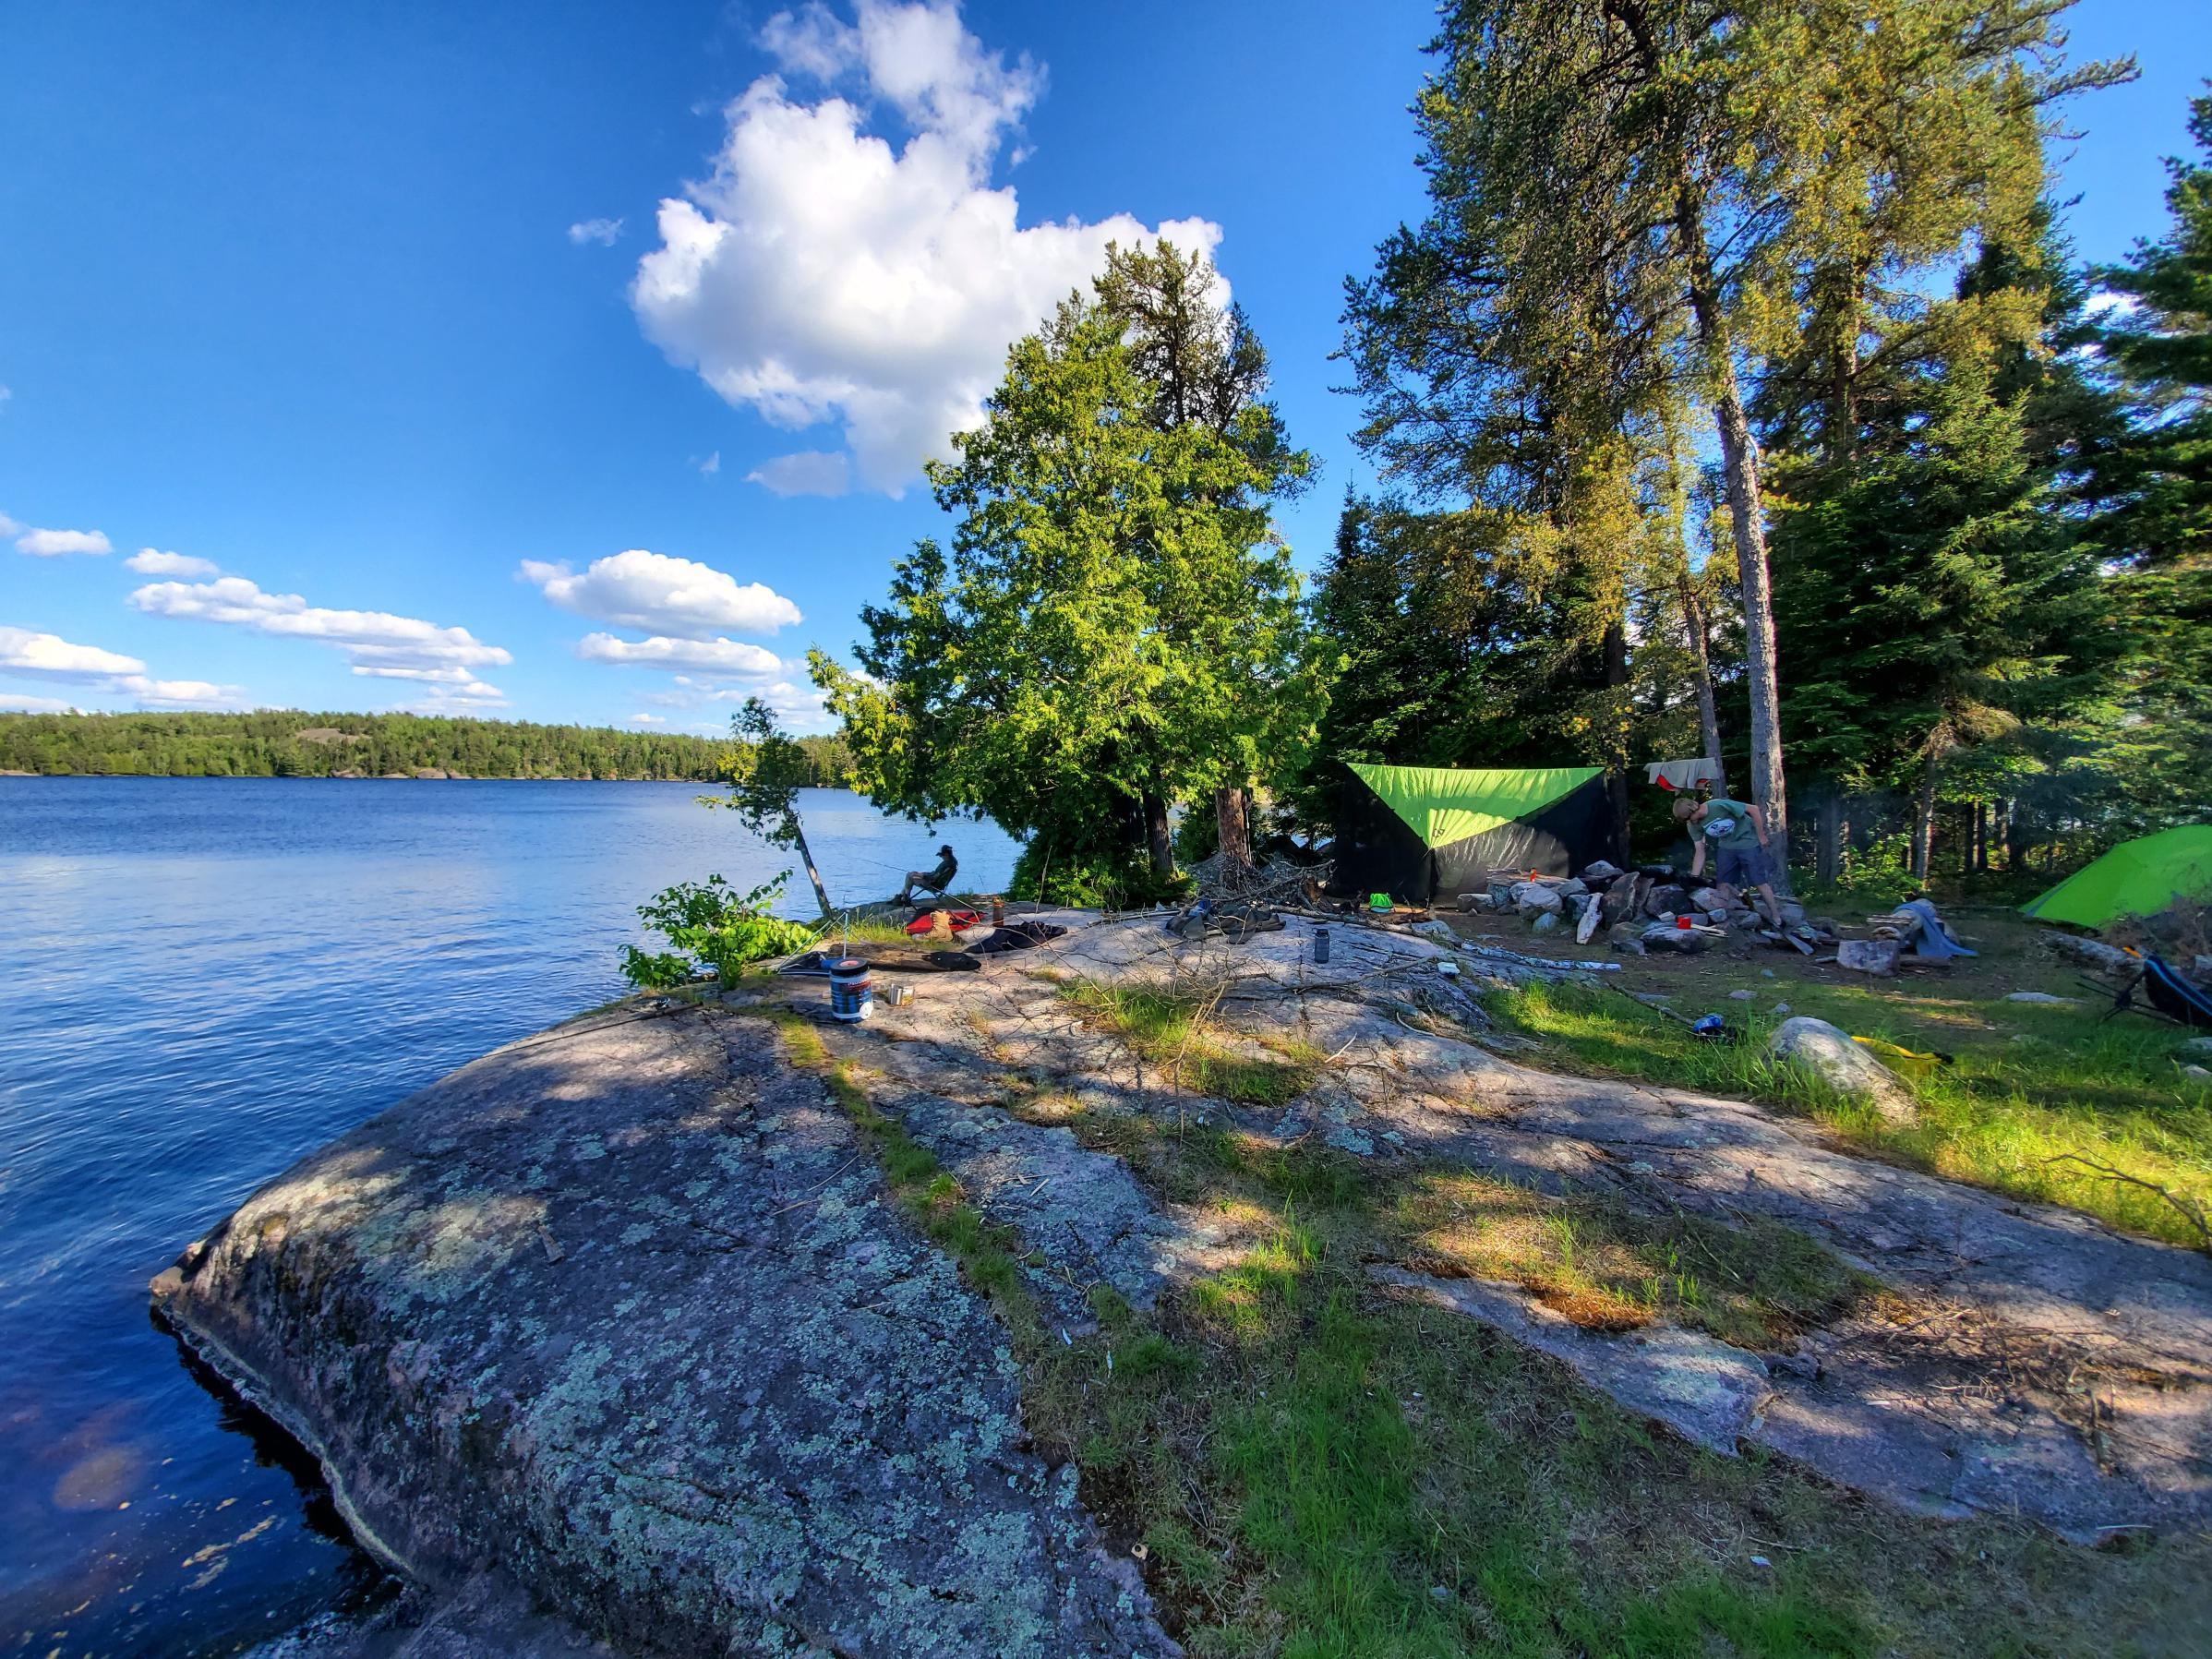 Our island campsite on Stuart